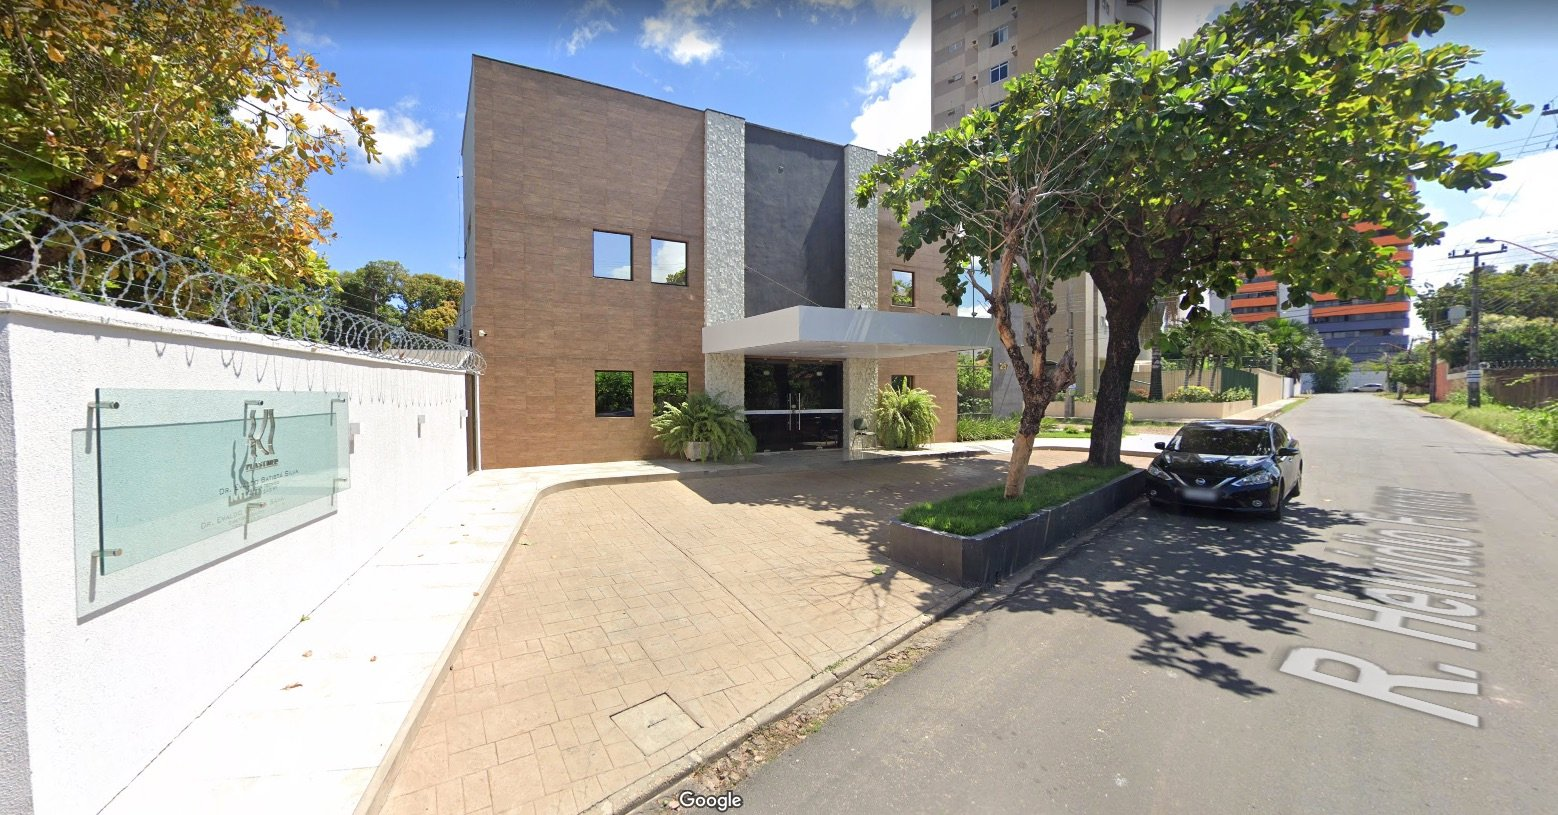 Segurança foi baleado na porta de hospital na zona Leste de Teresina - Foto: Google Maps